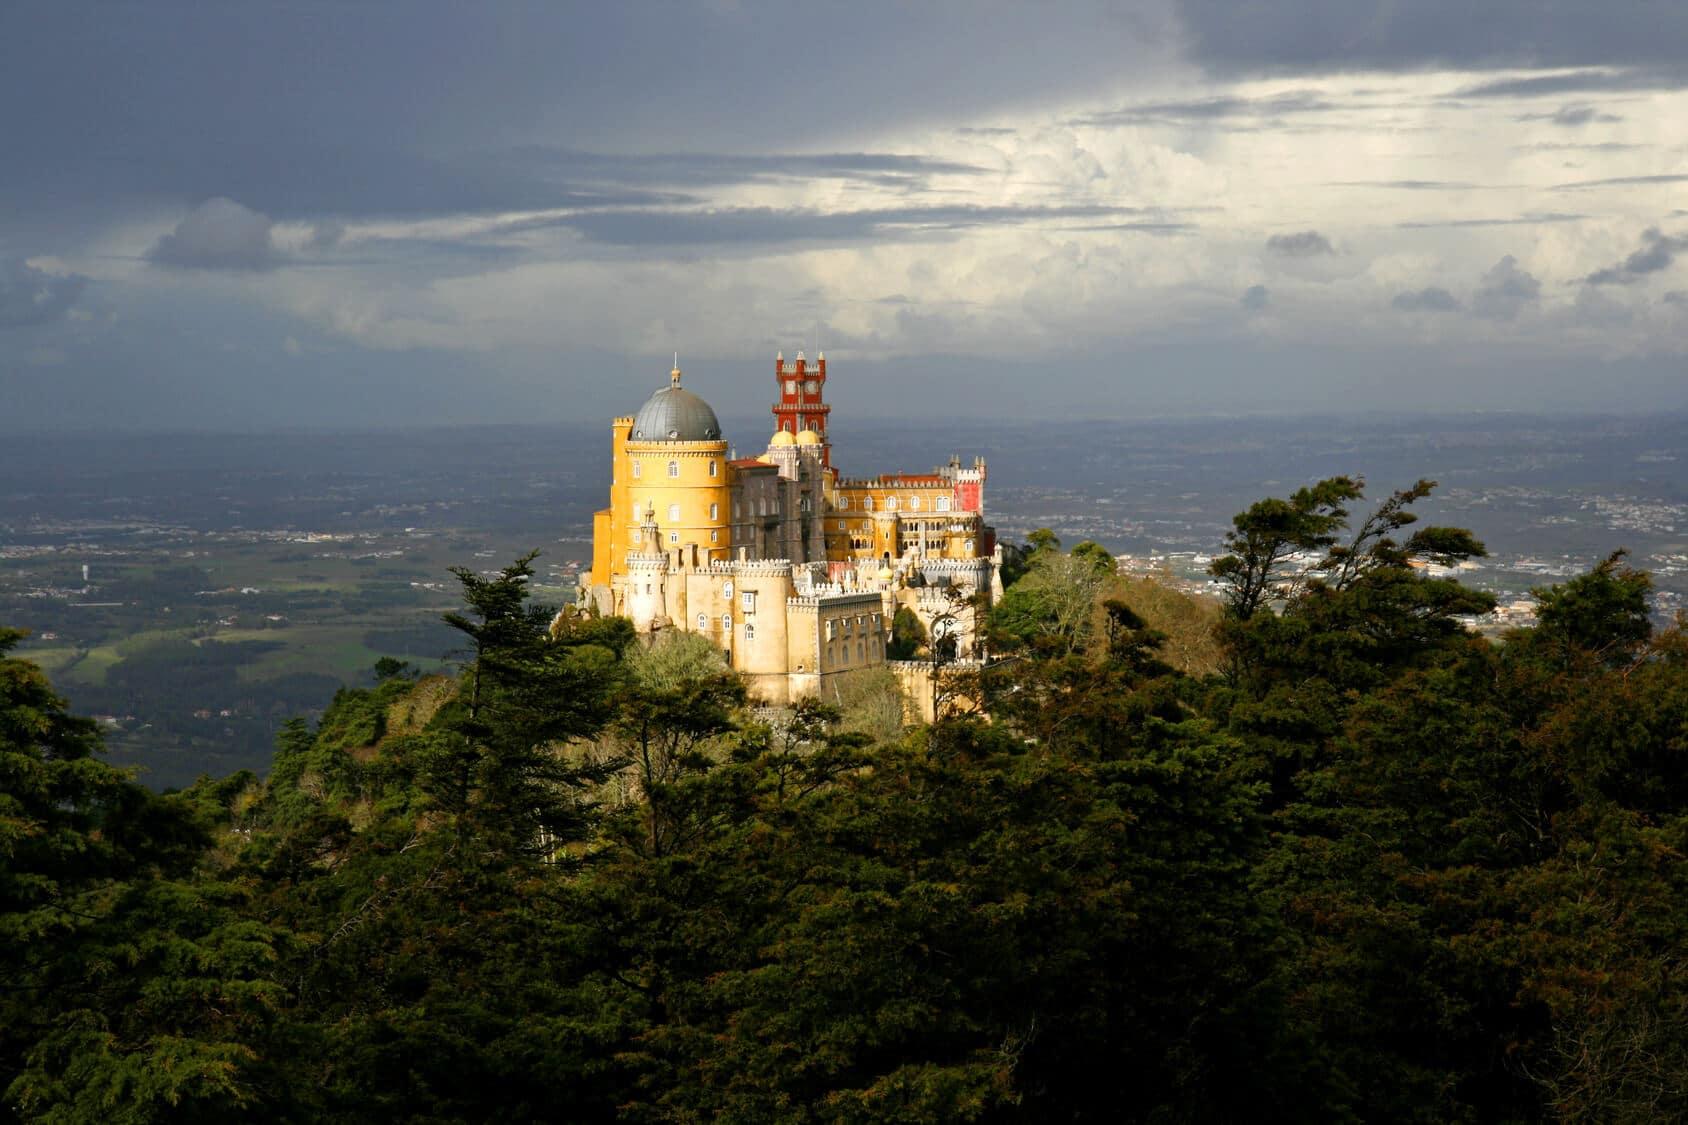 Visita Guiada Sintra: Palácio em Sintra